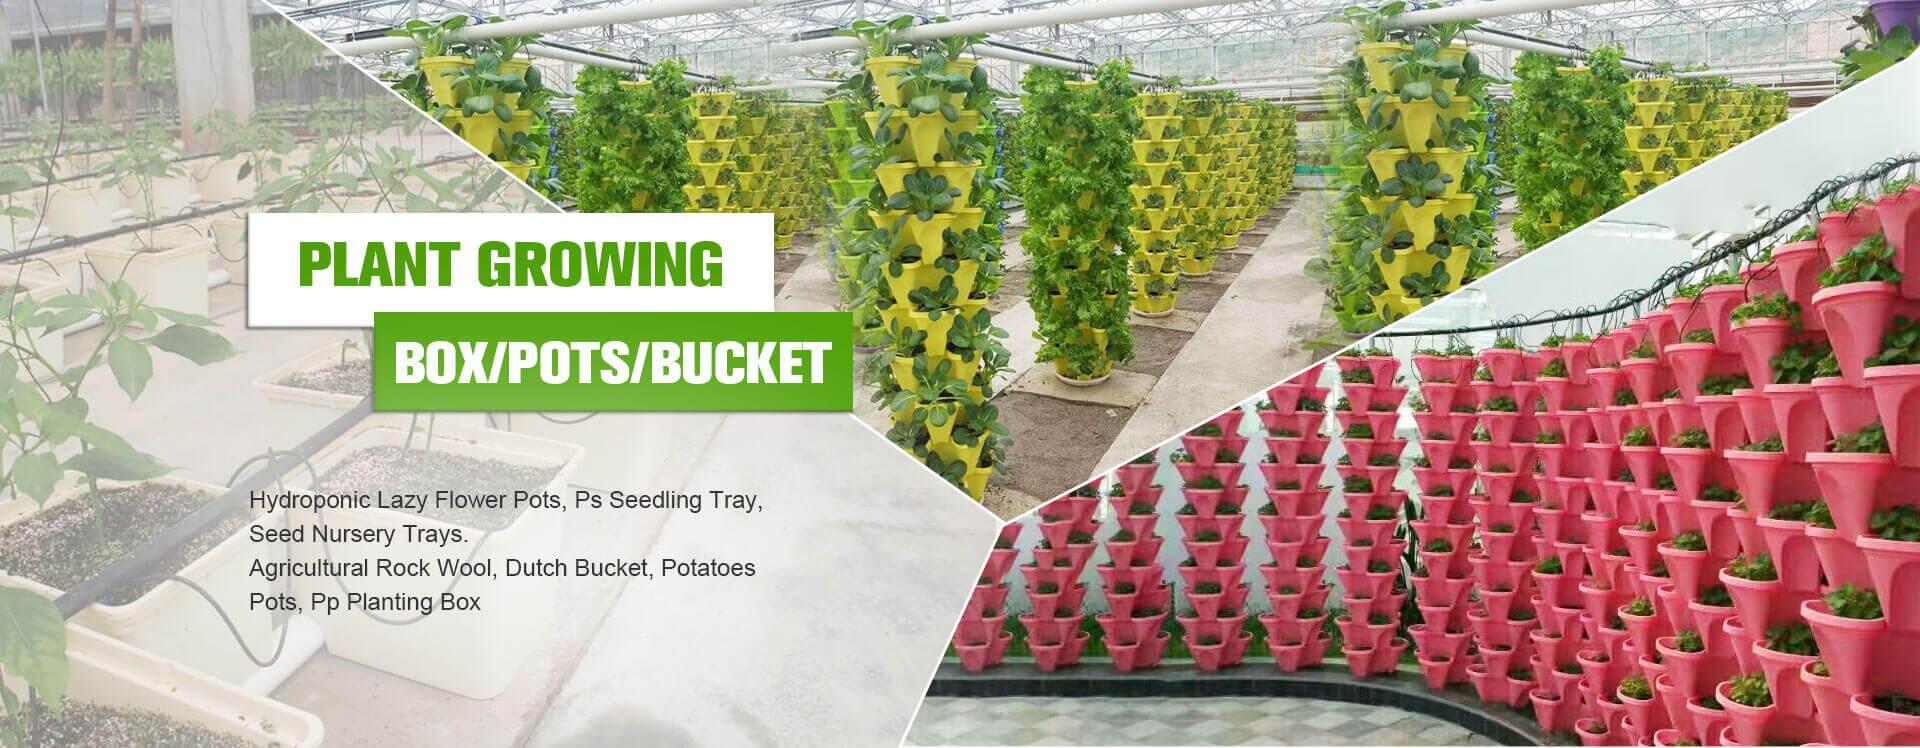 PLANT GROWING BOX/POTS/BUCKET